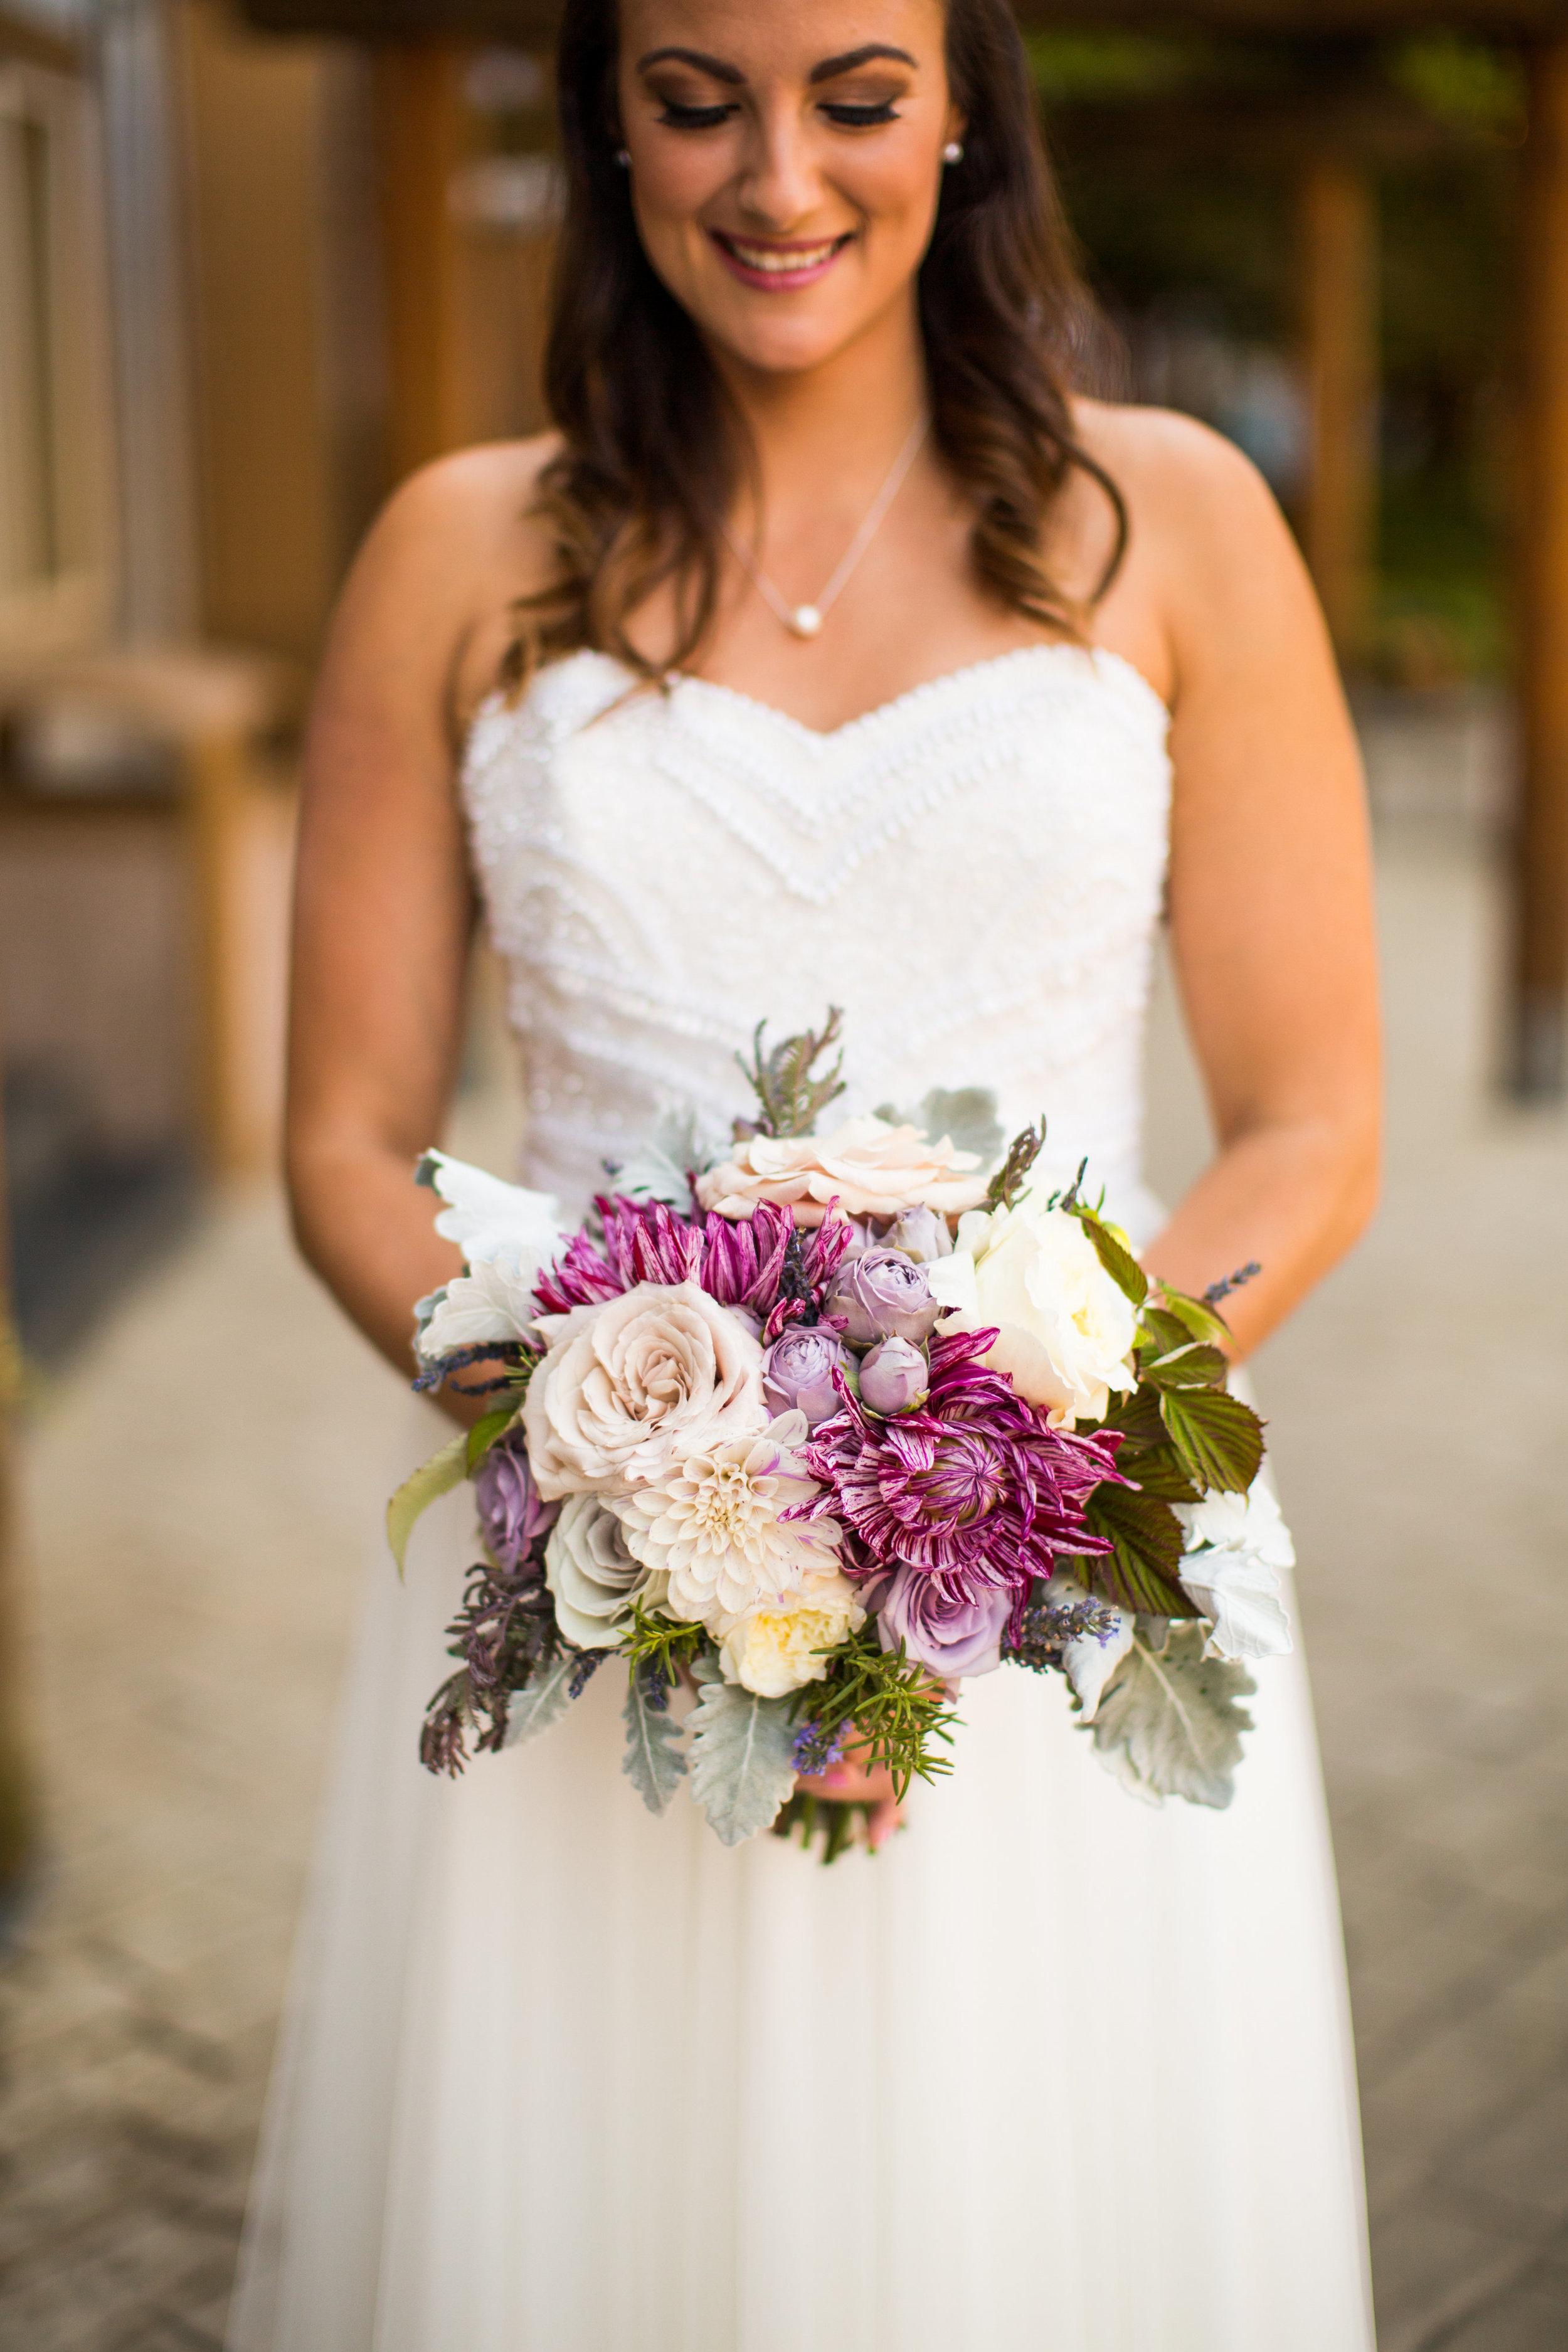 Seattle Wedding Planner, Wedding Wise | Ciccarelli Photography | Edgewater Hotel Wedding | Purple and cream wedding bouquet | Bridal bouquet